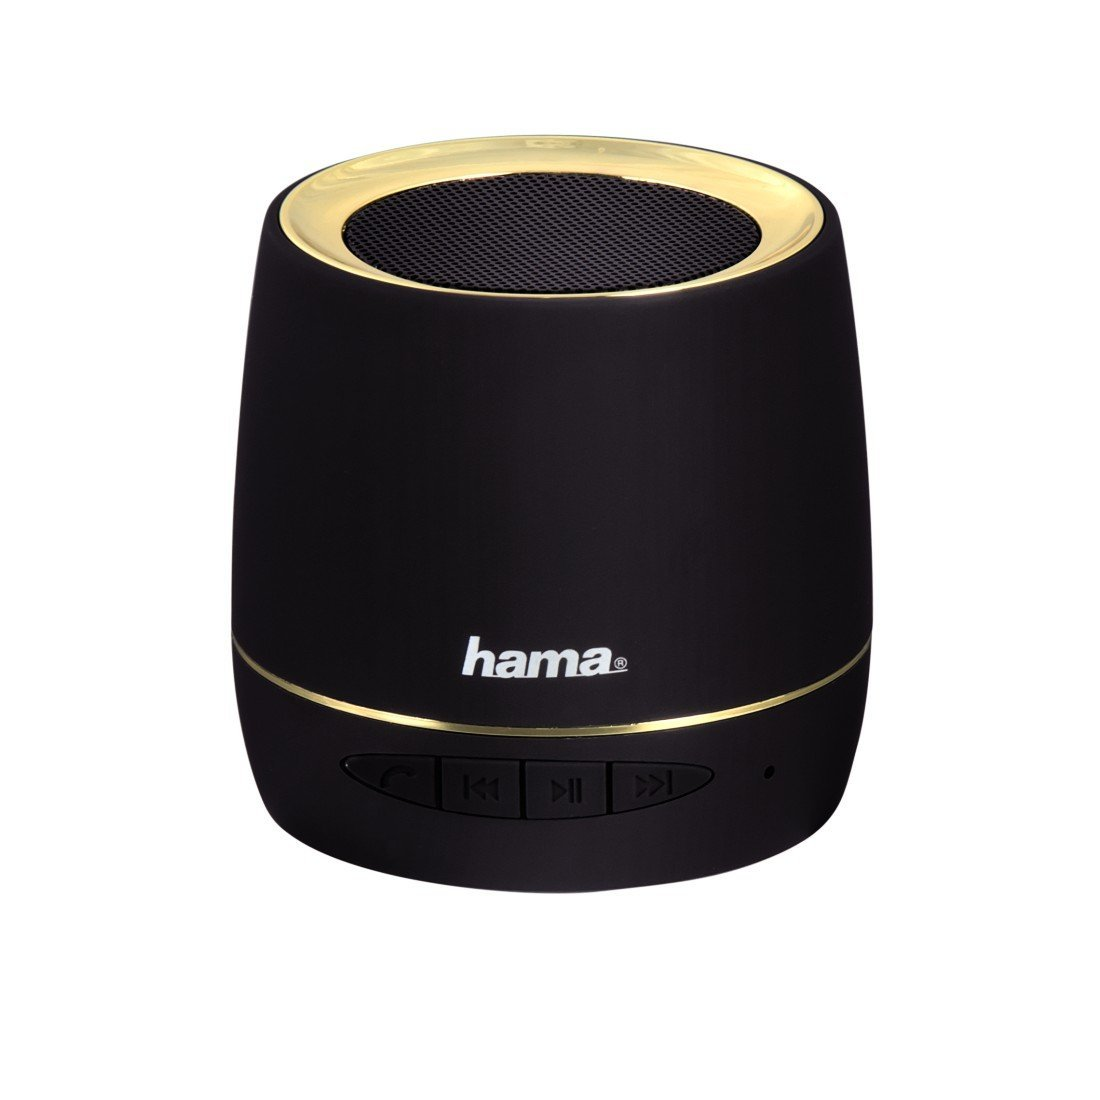 Hama Bluetooth Lautsprecher amazon